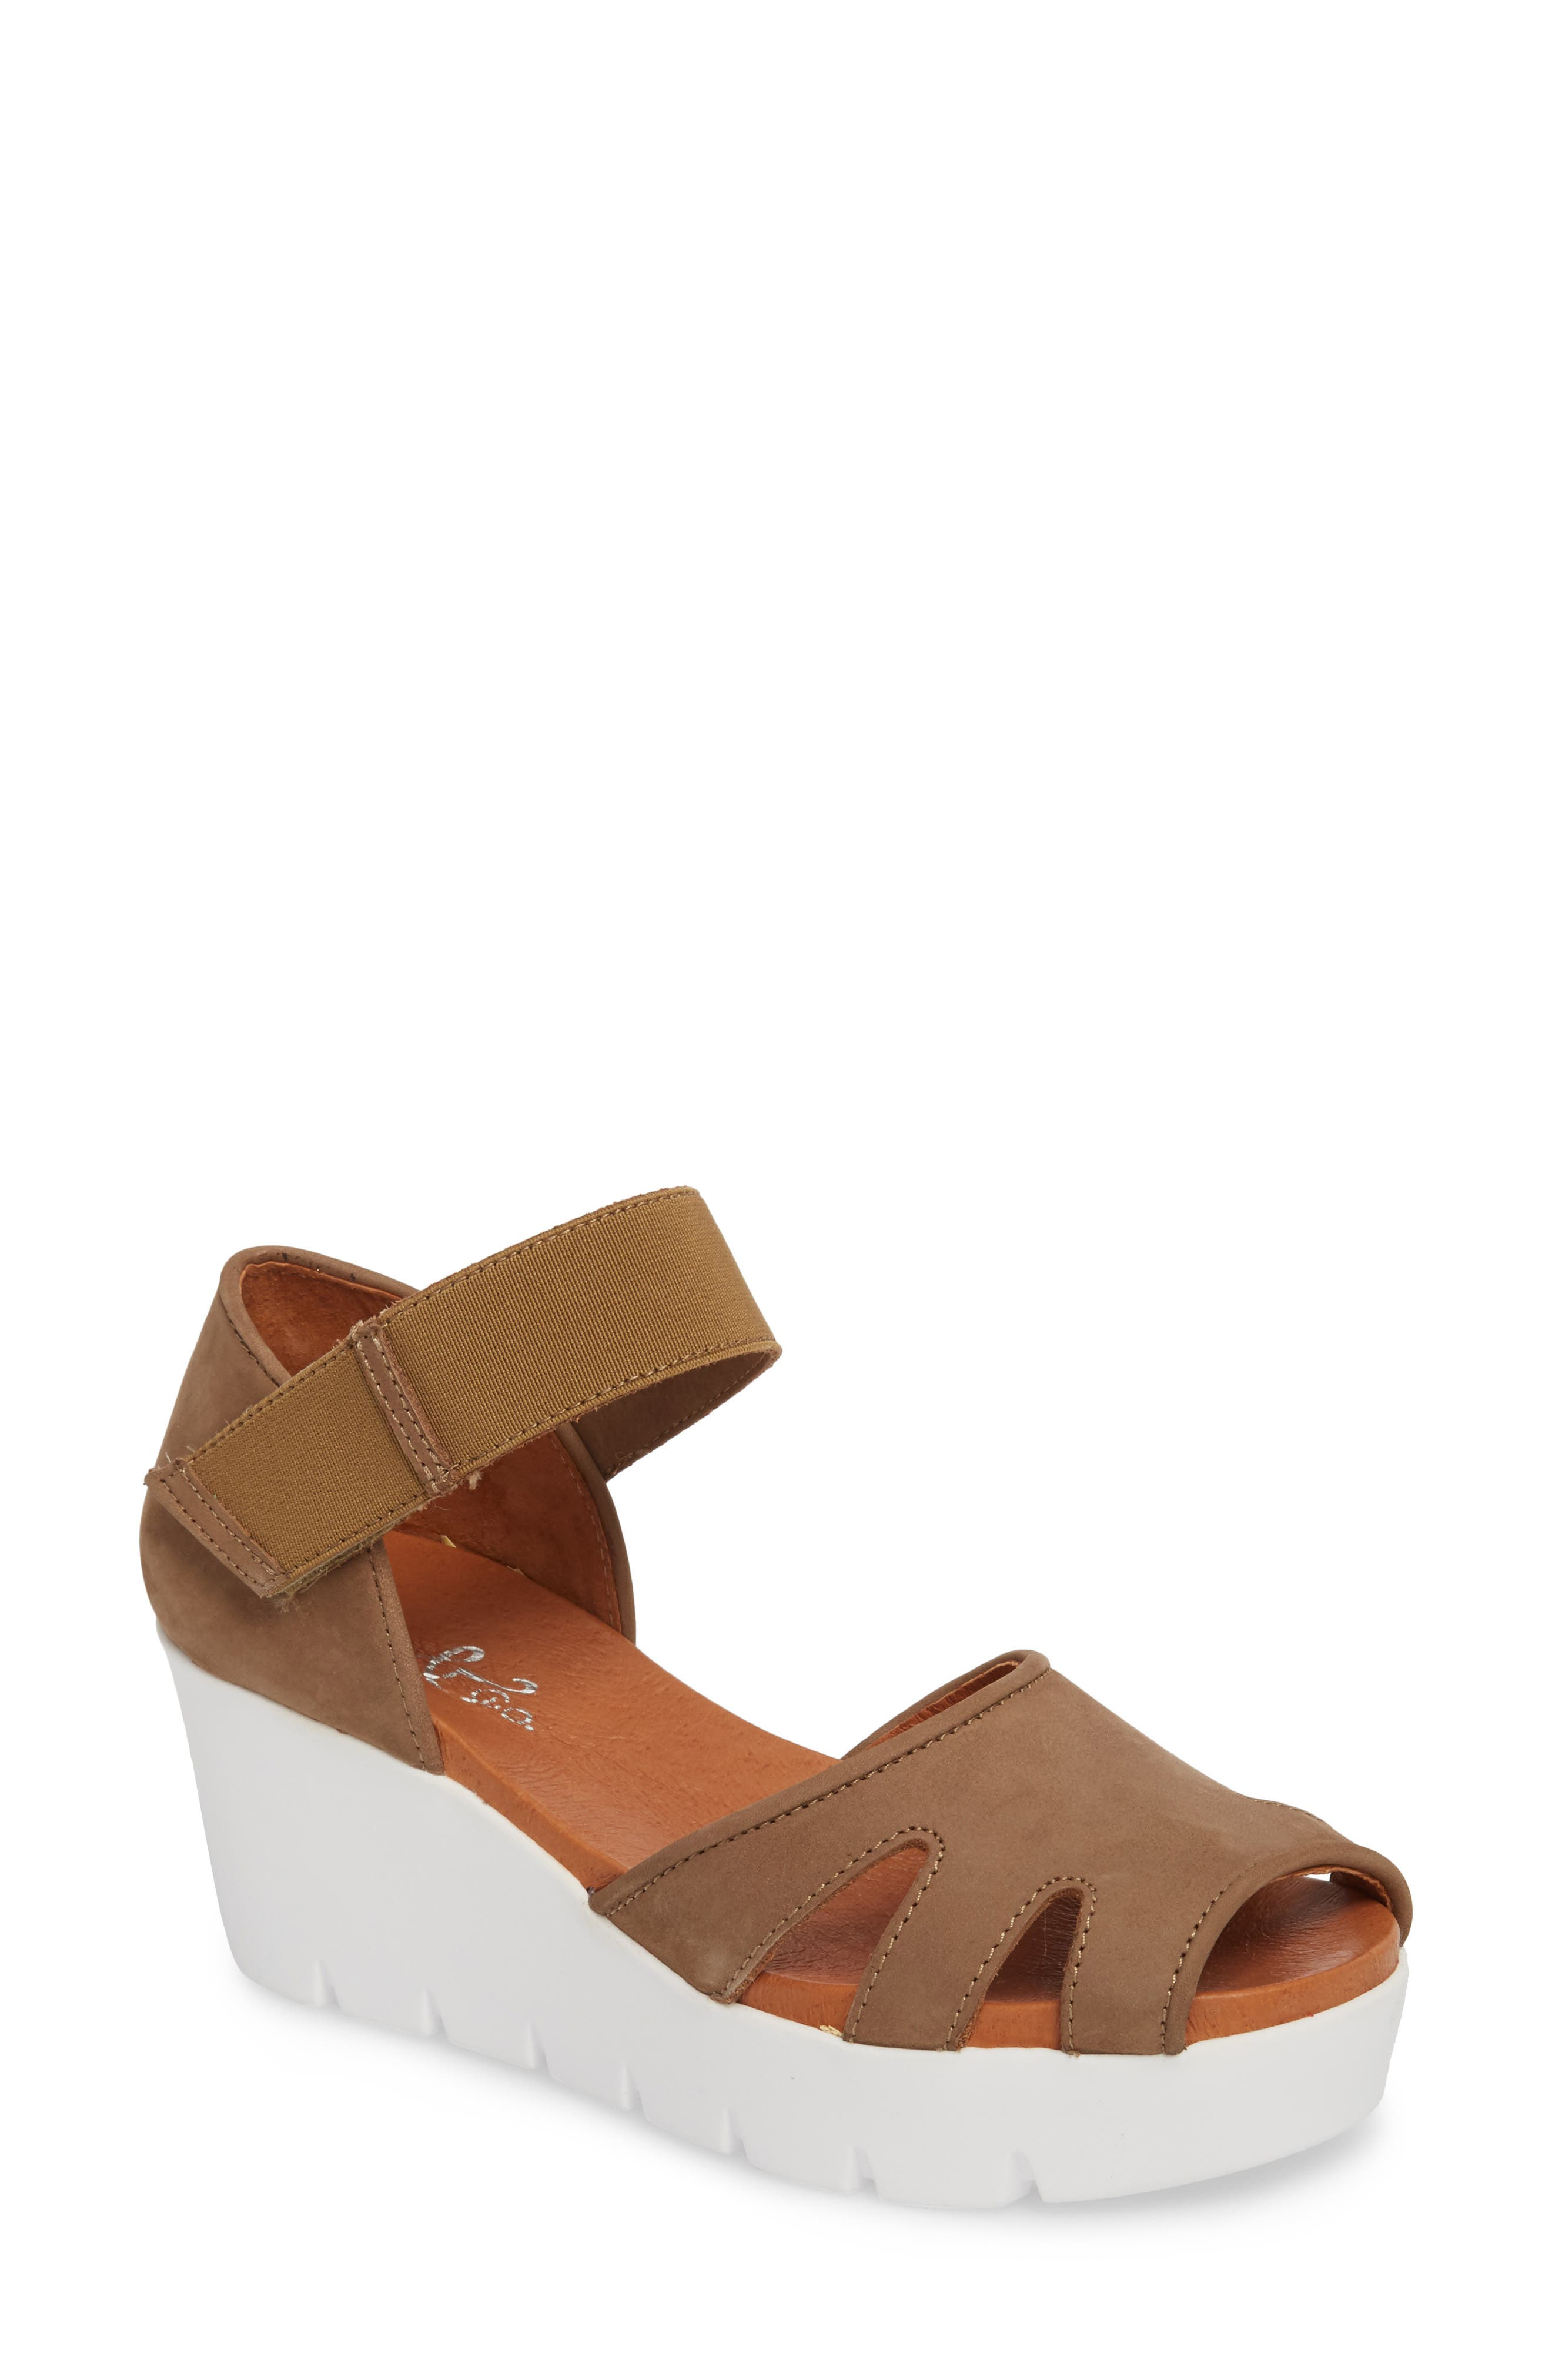 Bos. & Co. Sharon Platform Wedge Sandal, Brown